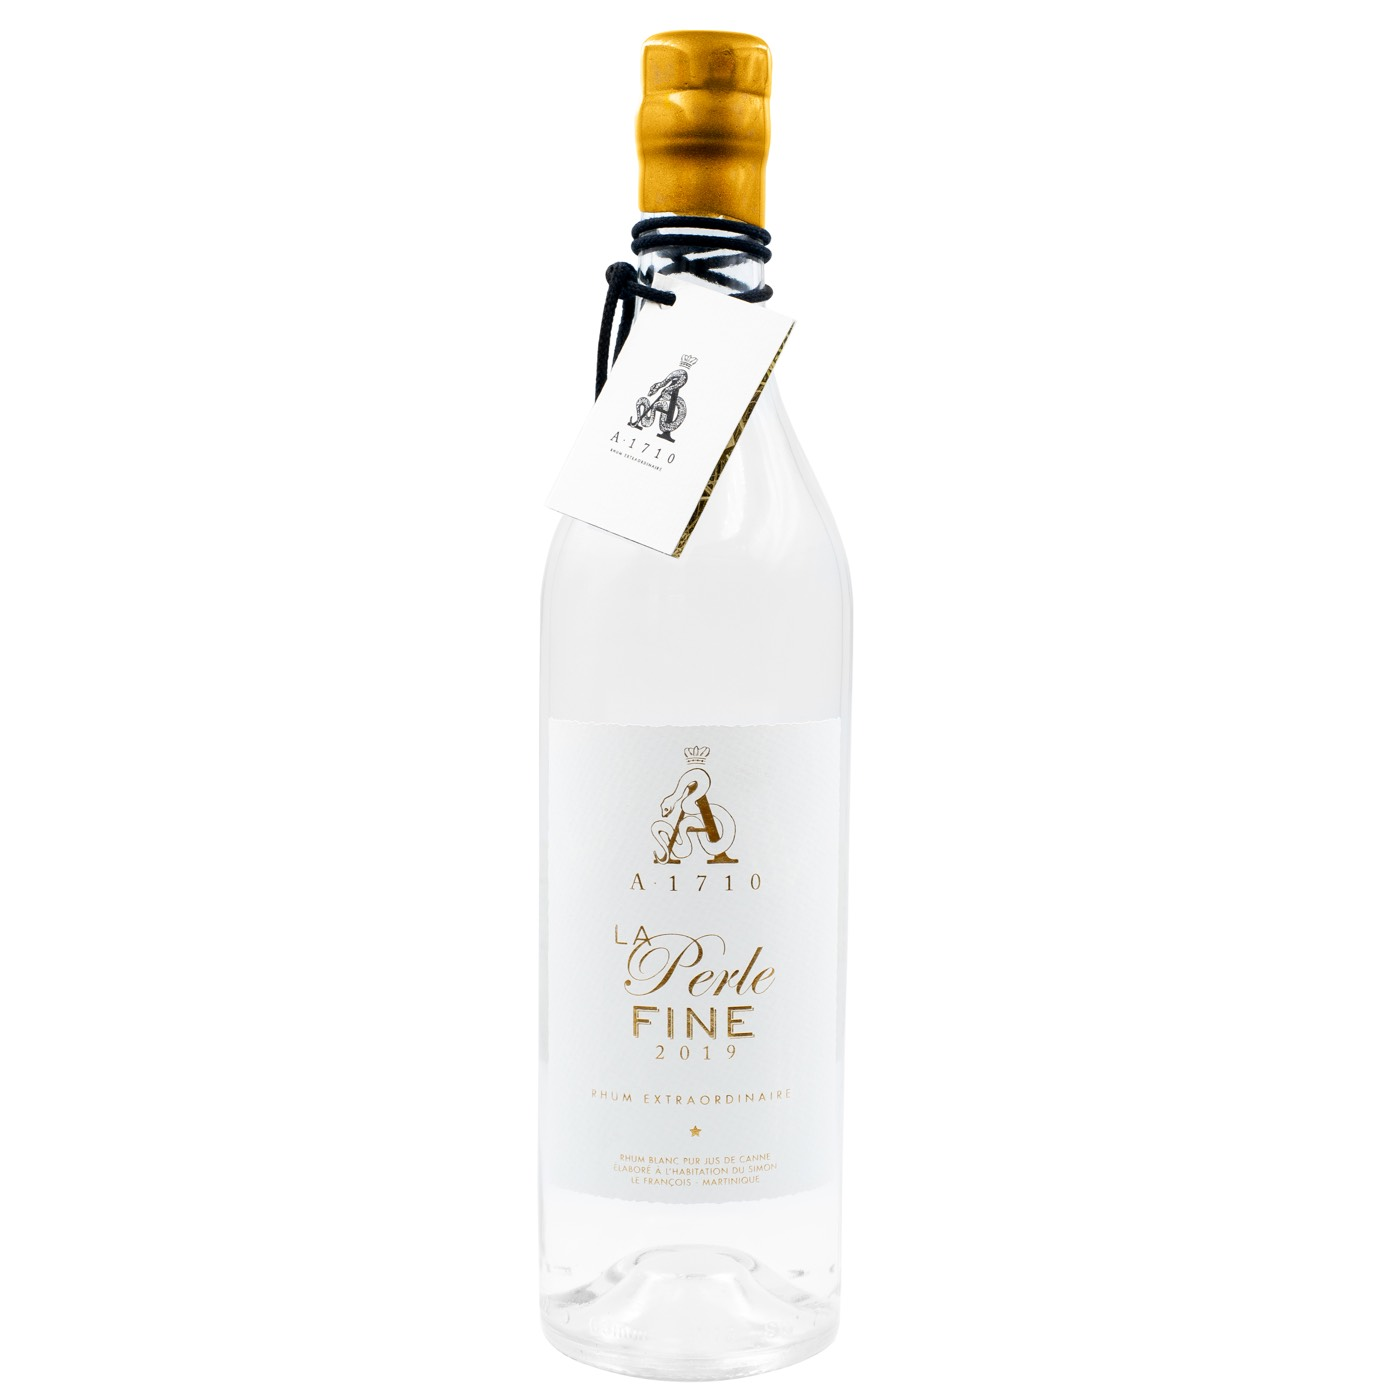 Bottle image of A1710 La Perle Fine